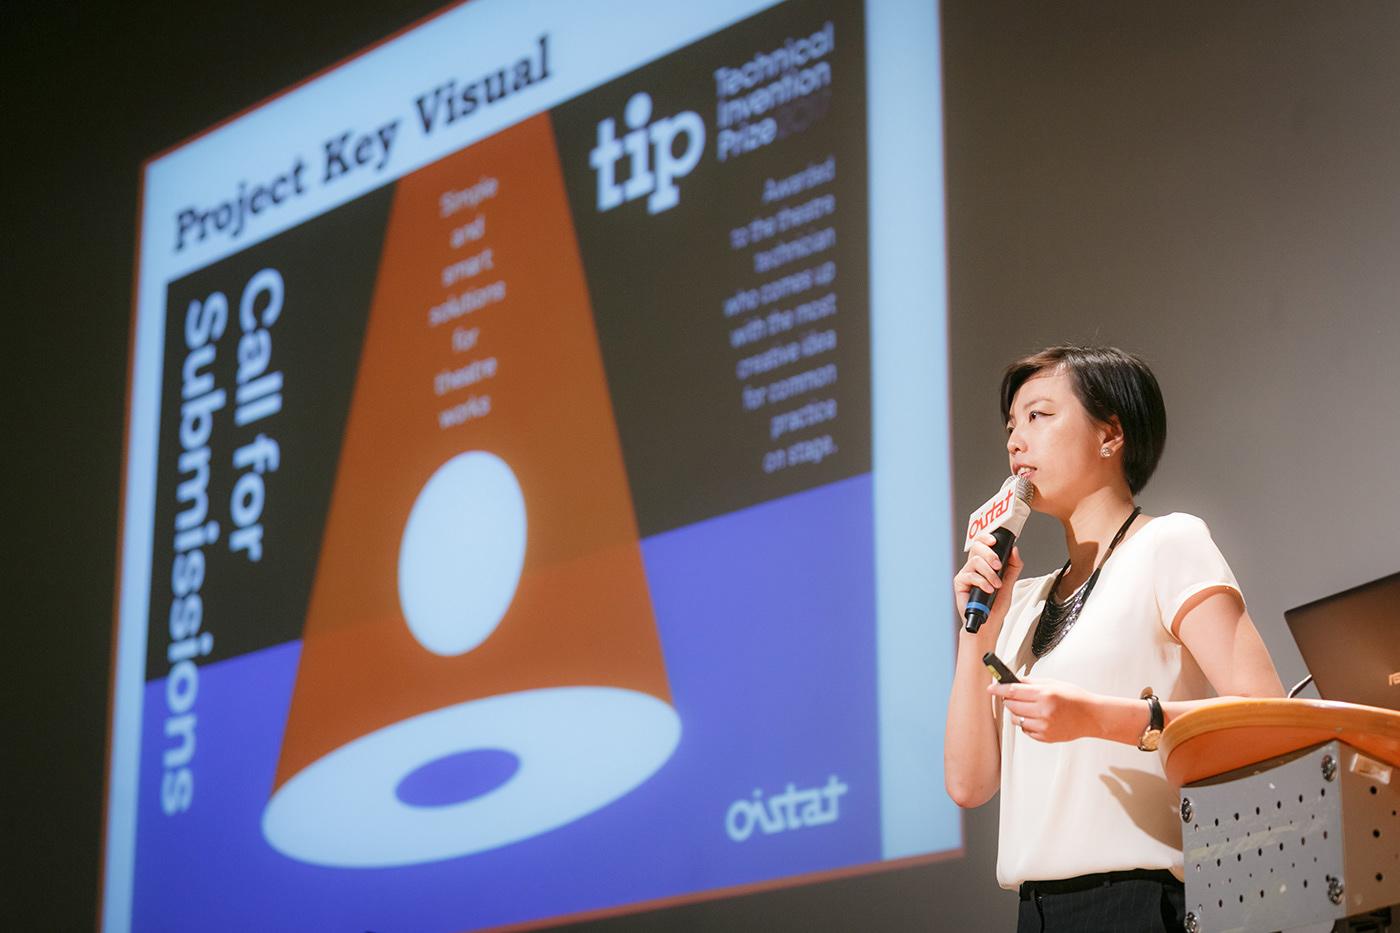 Logo Design Identity Design Poster Design minimal design award identity event identity award design competition identity design comprtition logo event logo